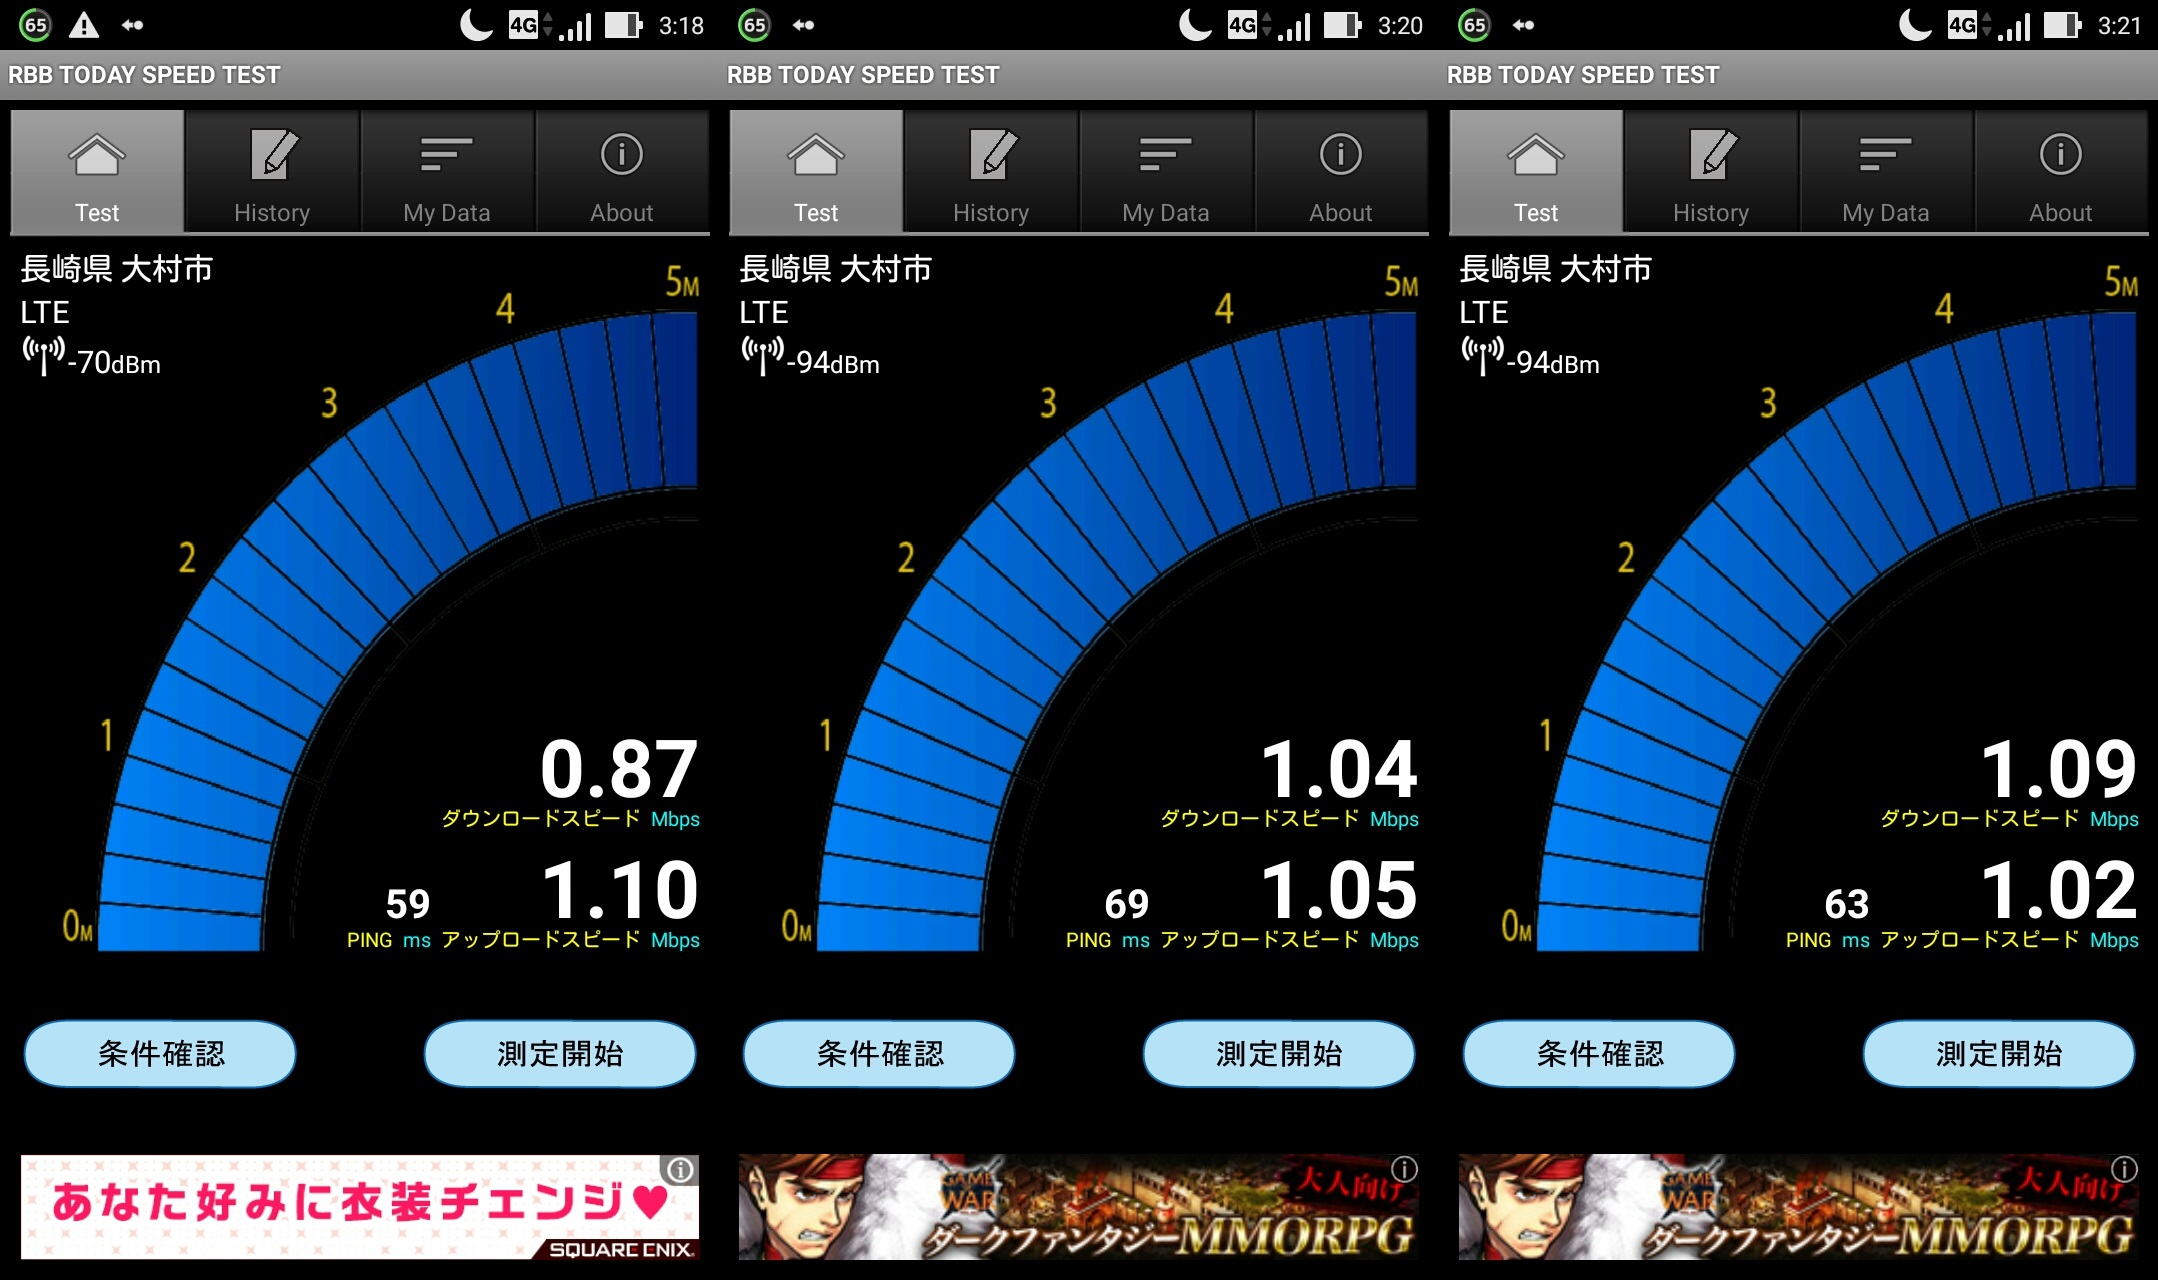 Screenshot_2015-10-06-03-18-21